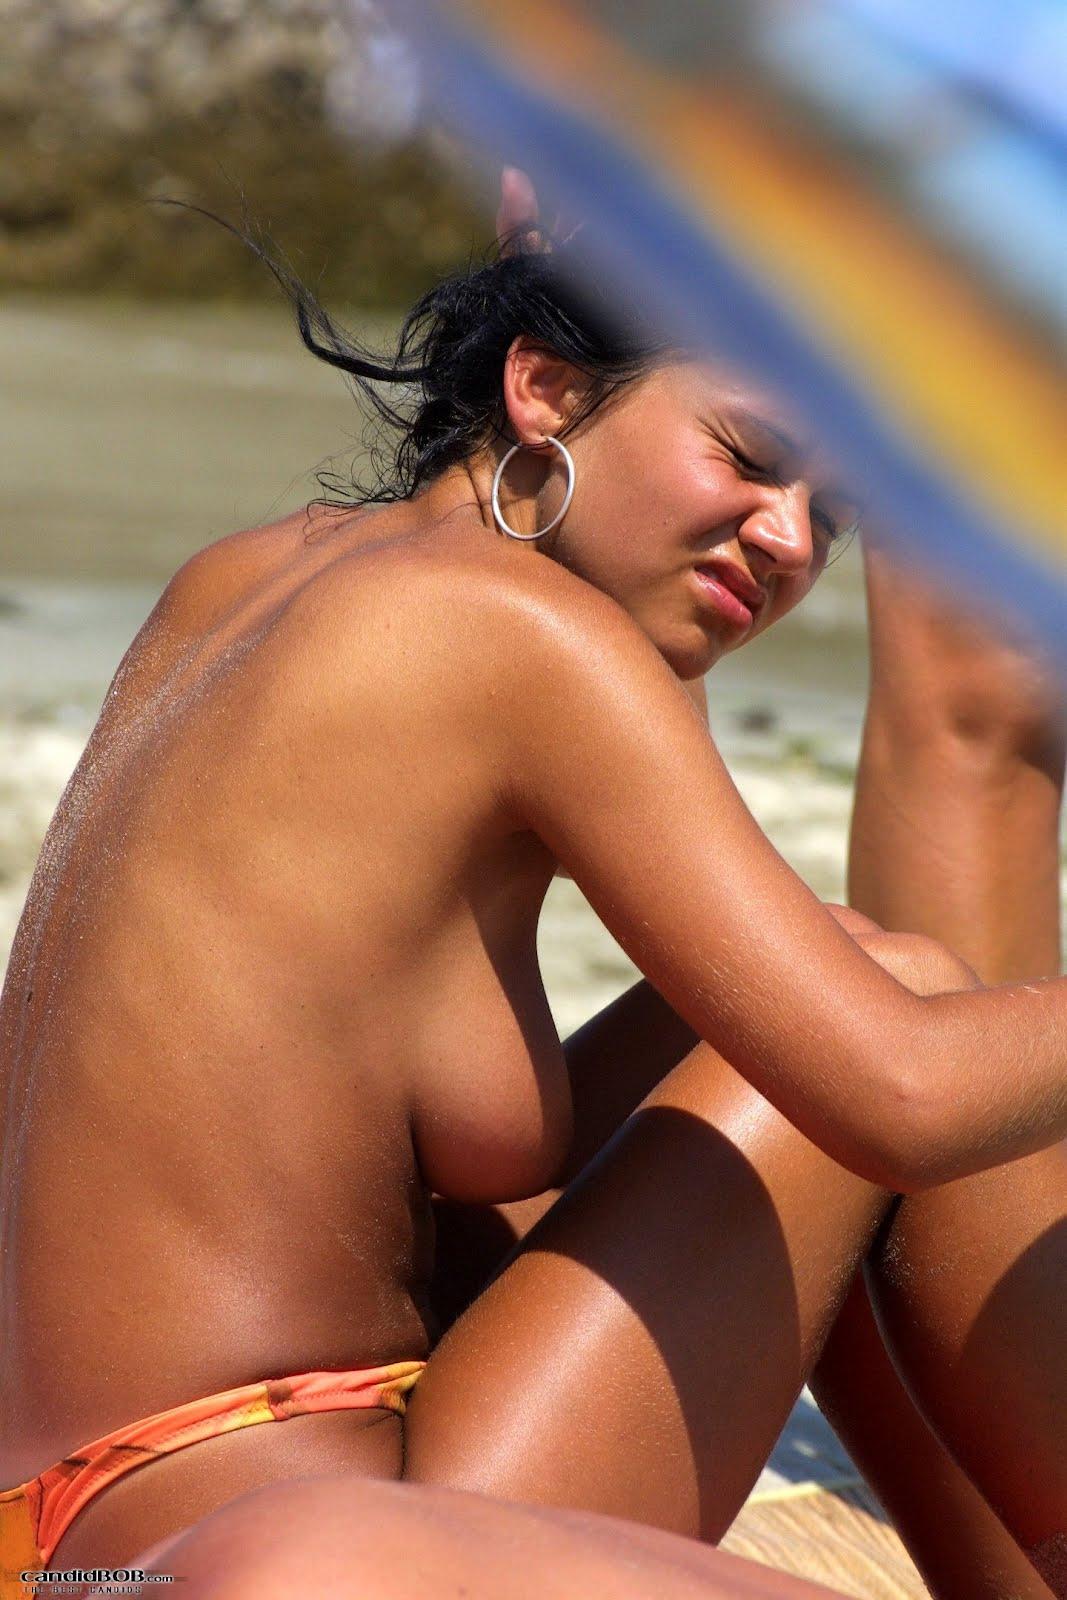 Candid Beach Voyeur  Free Porn Pictures-8346